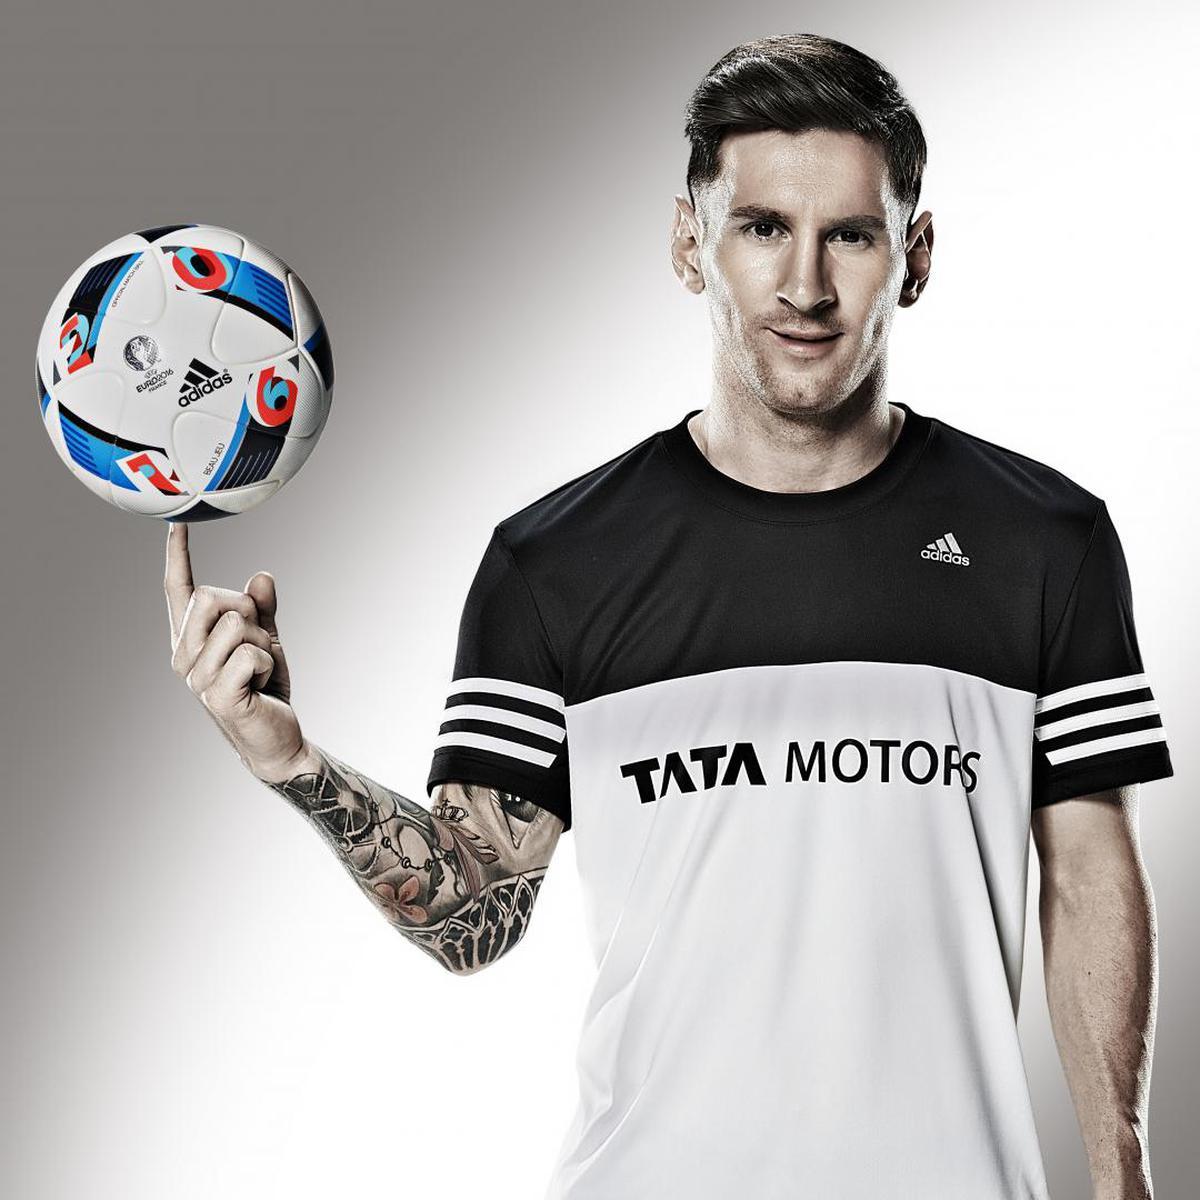 Image of T-shirt, Jersey, Soccer ball, Sportswear, Football, Player etc.